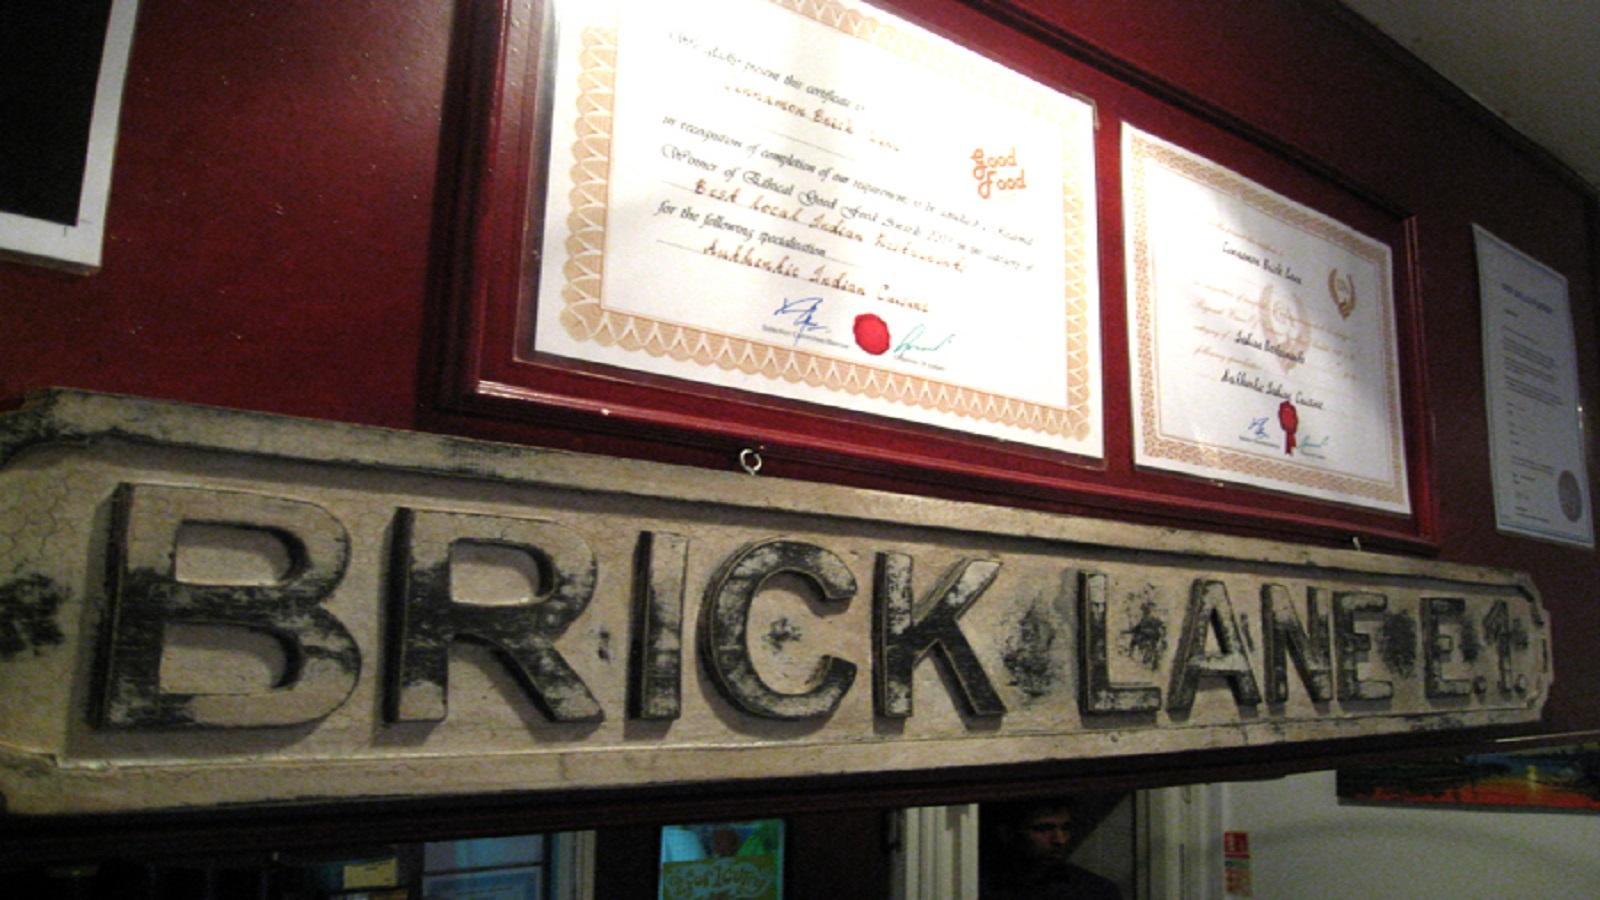 Cinnamon Brick Lane